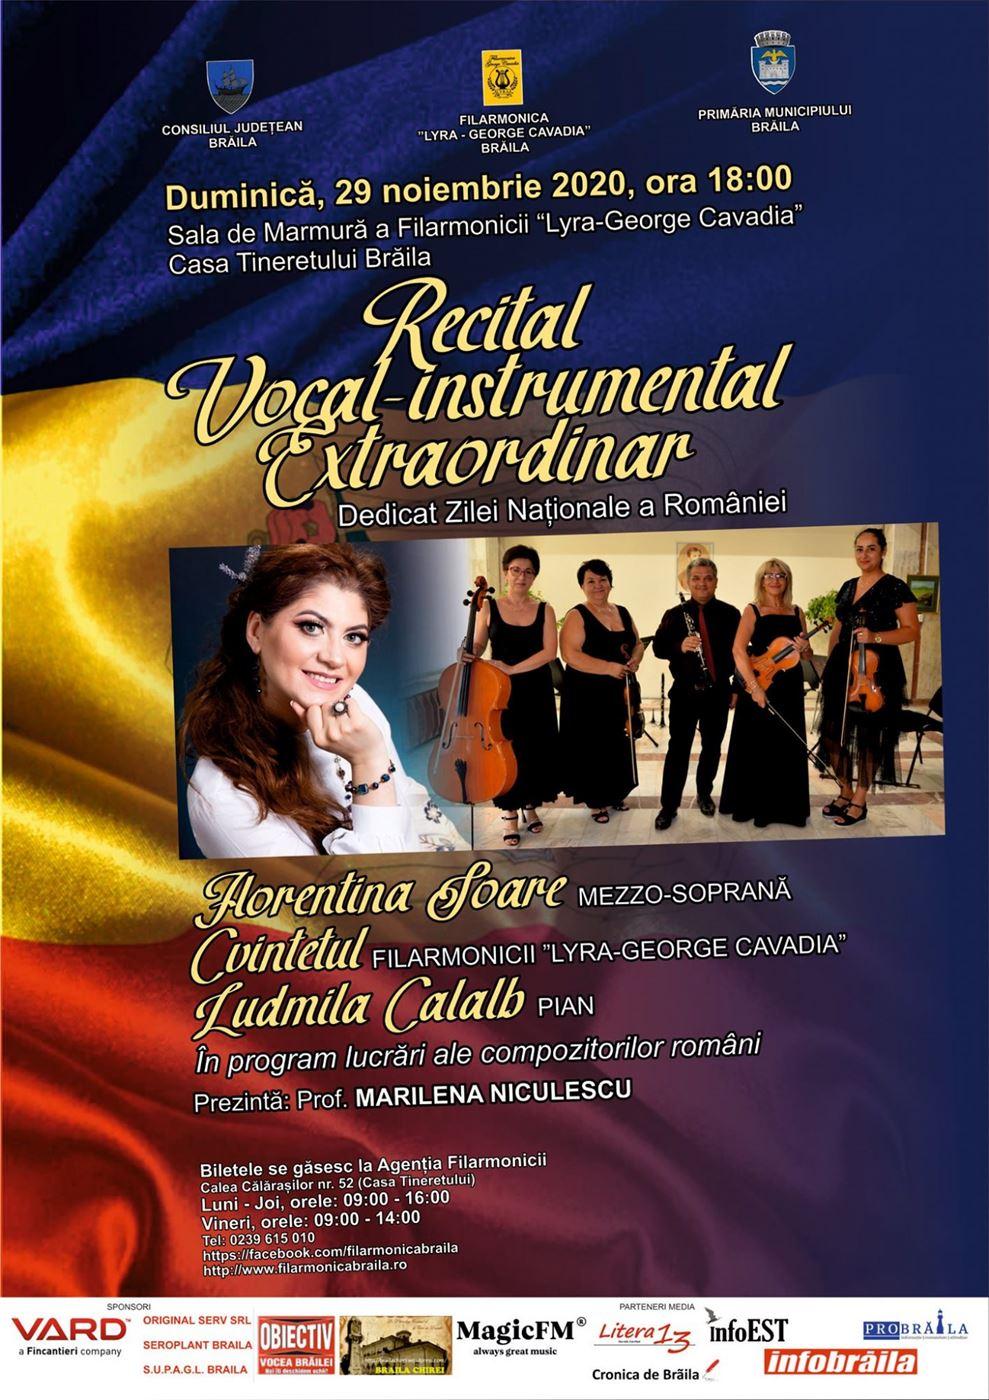 Recital vocal – instrumental extraordinar dedicat Zilei Naționale a României